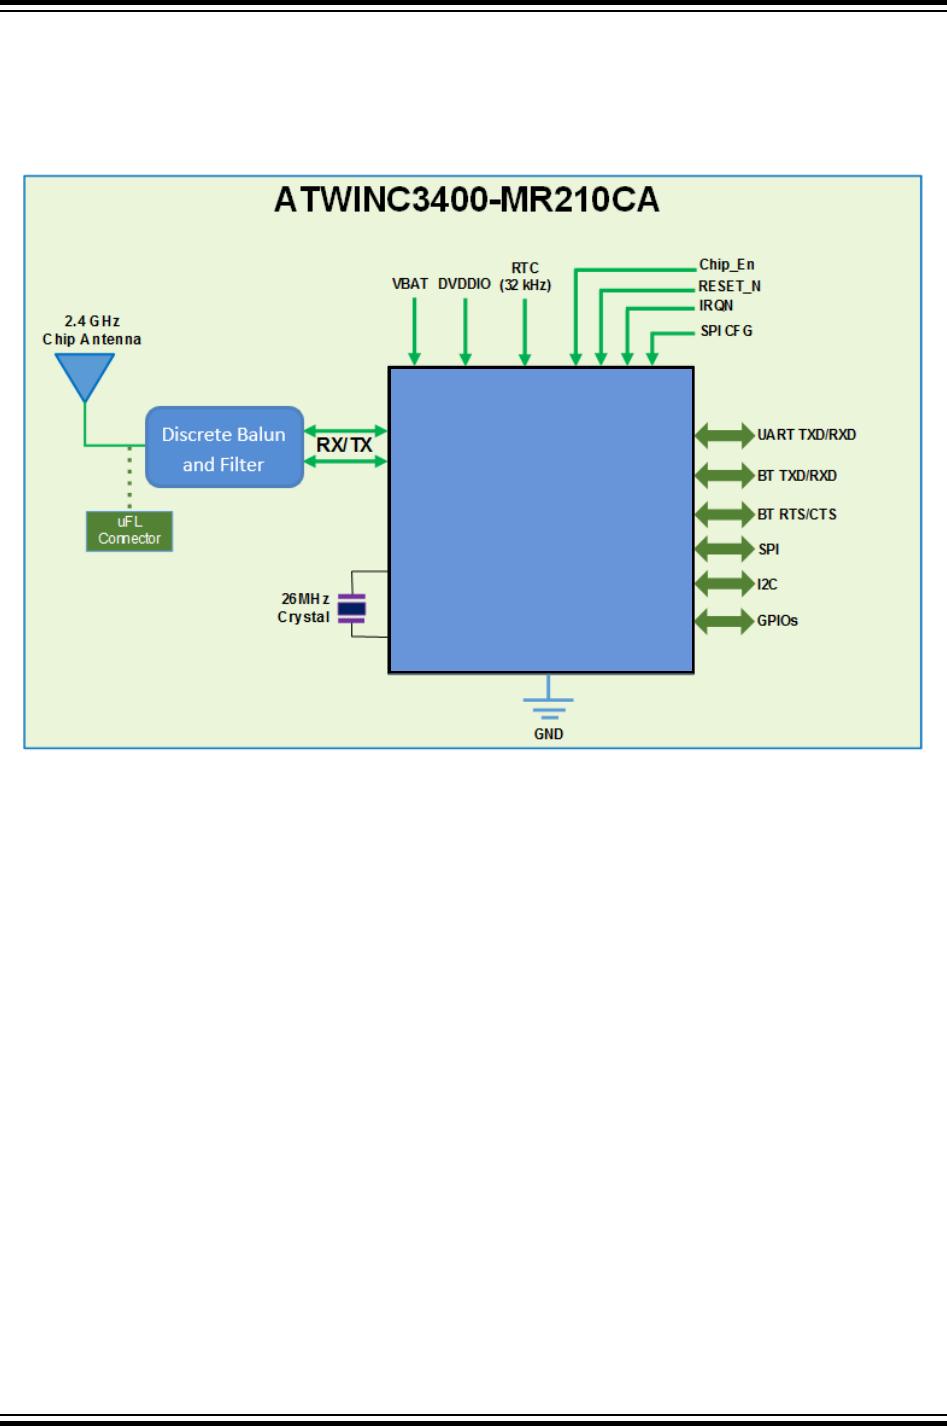 Microchip Technology Winc3400 Atwinc3400 Mr210ca User Manual Figure 2 Spi Timing Diagram Block